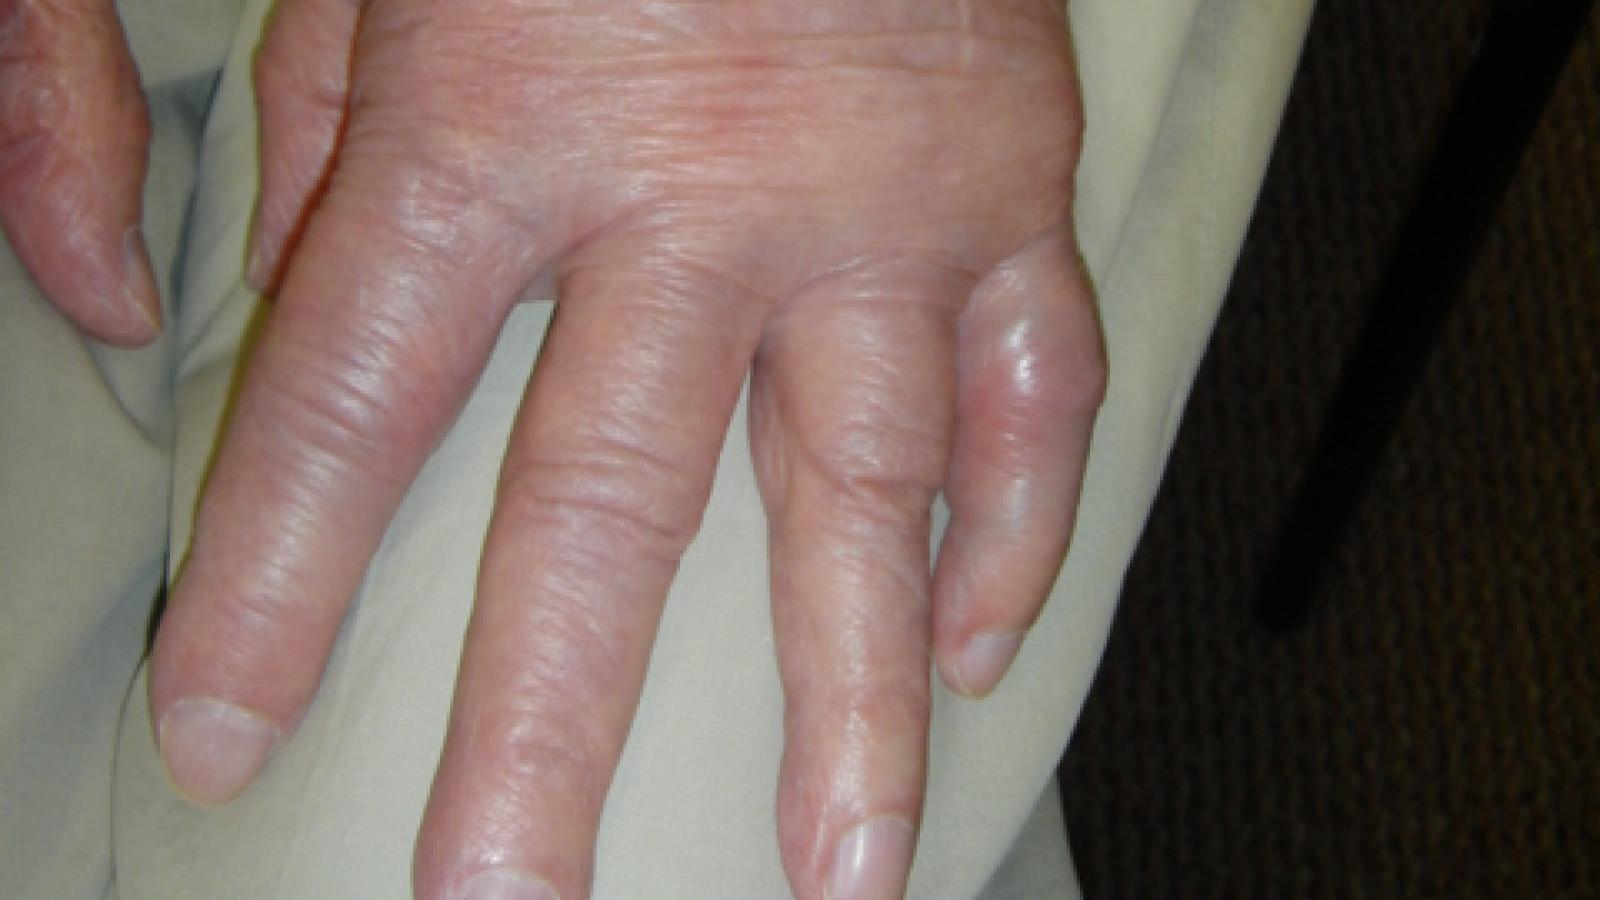 RA,hand,elderly,active